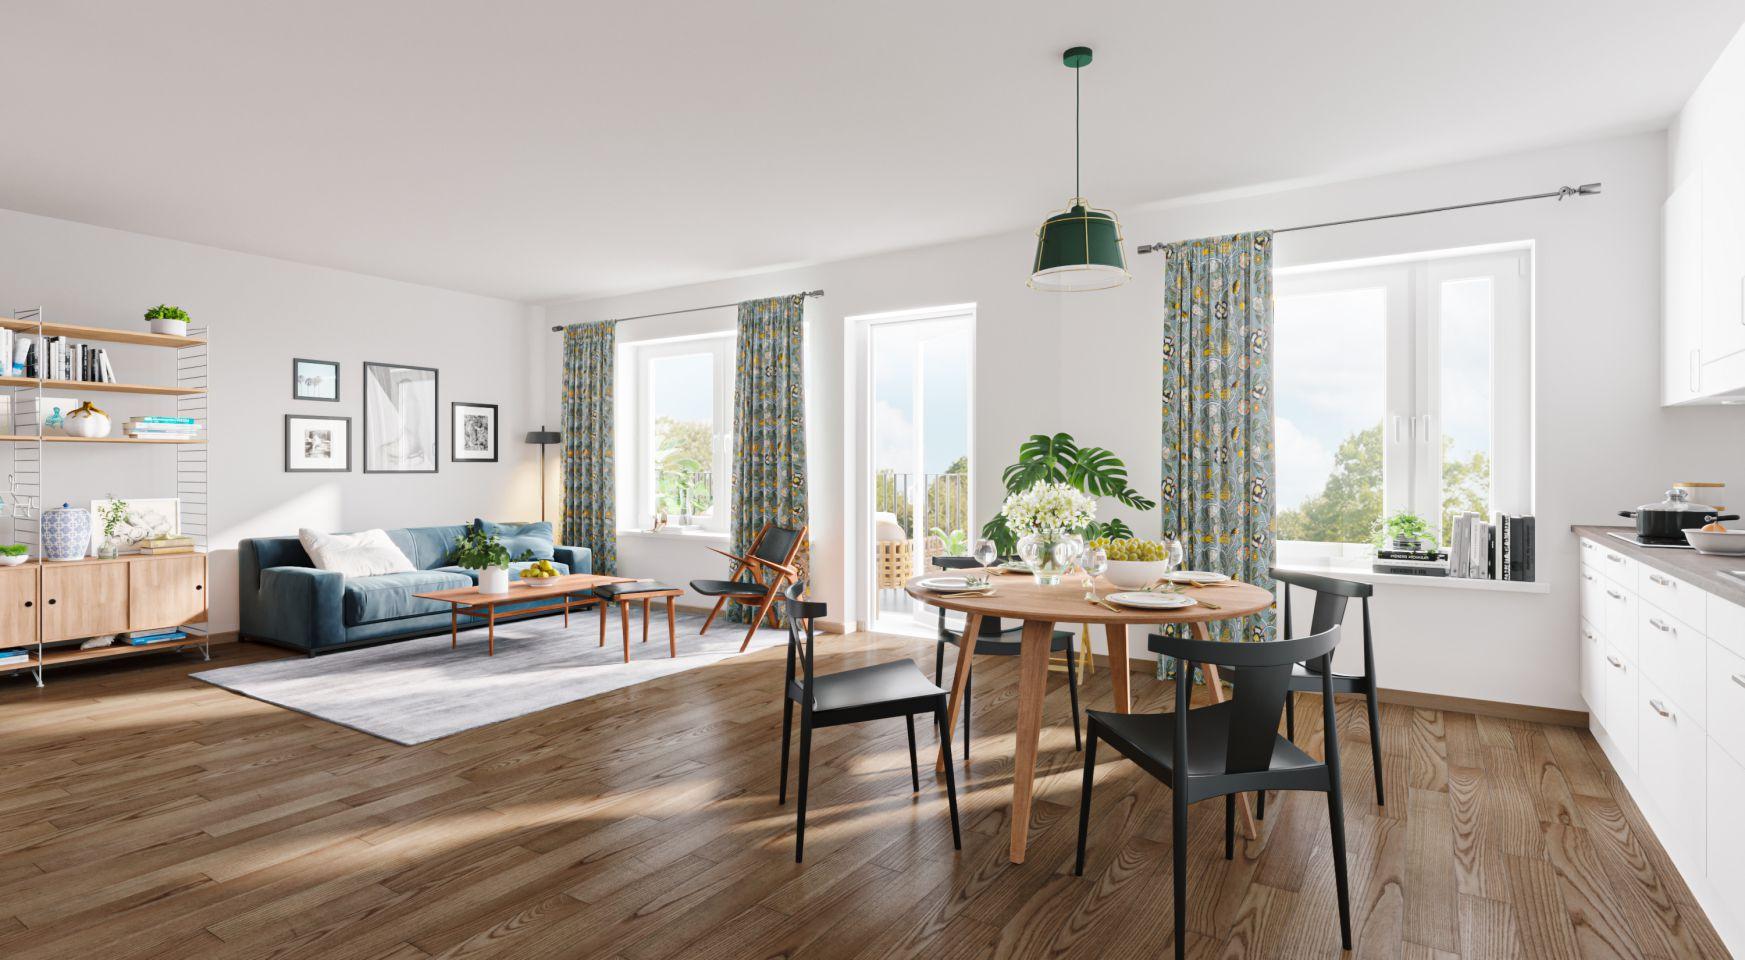 Residential Interior Design Rendering